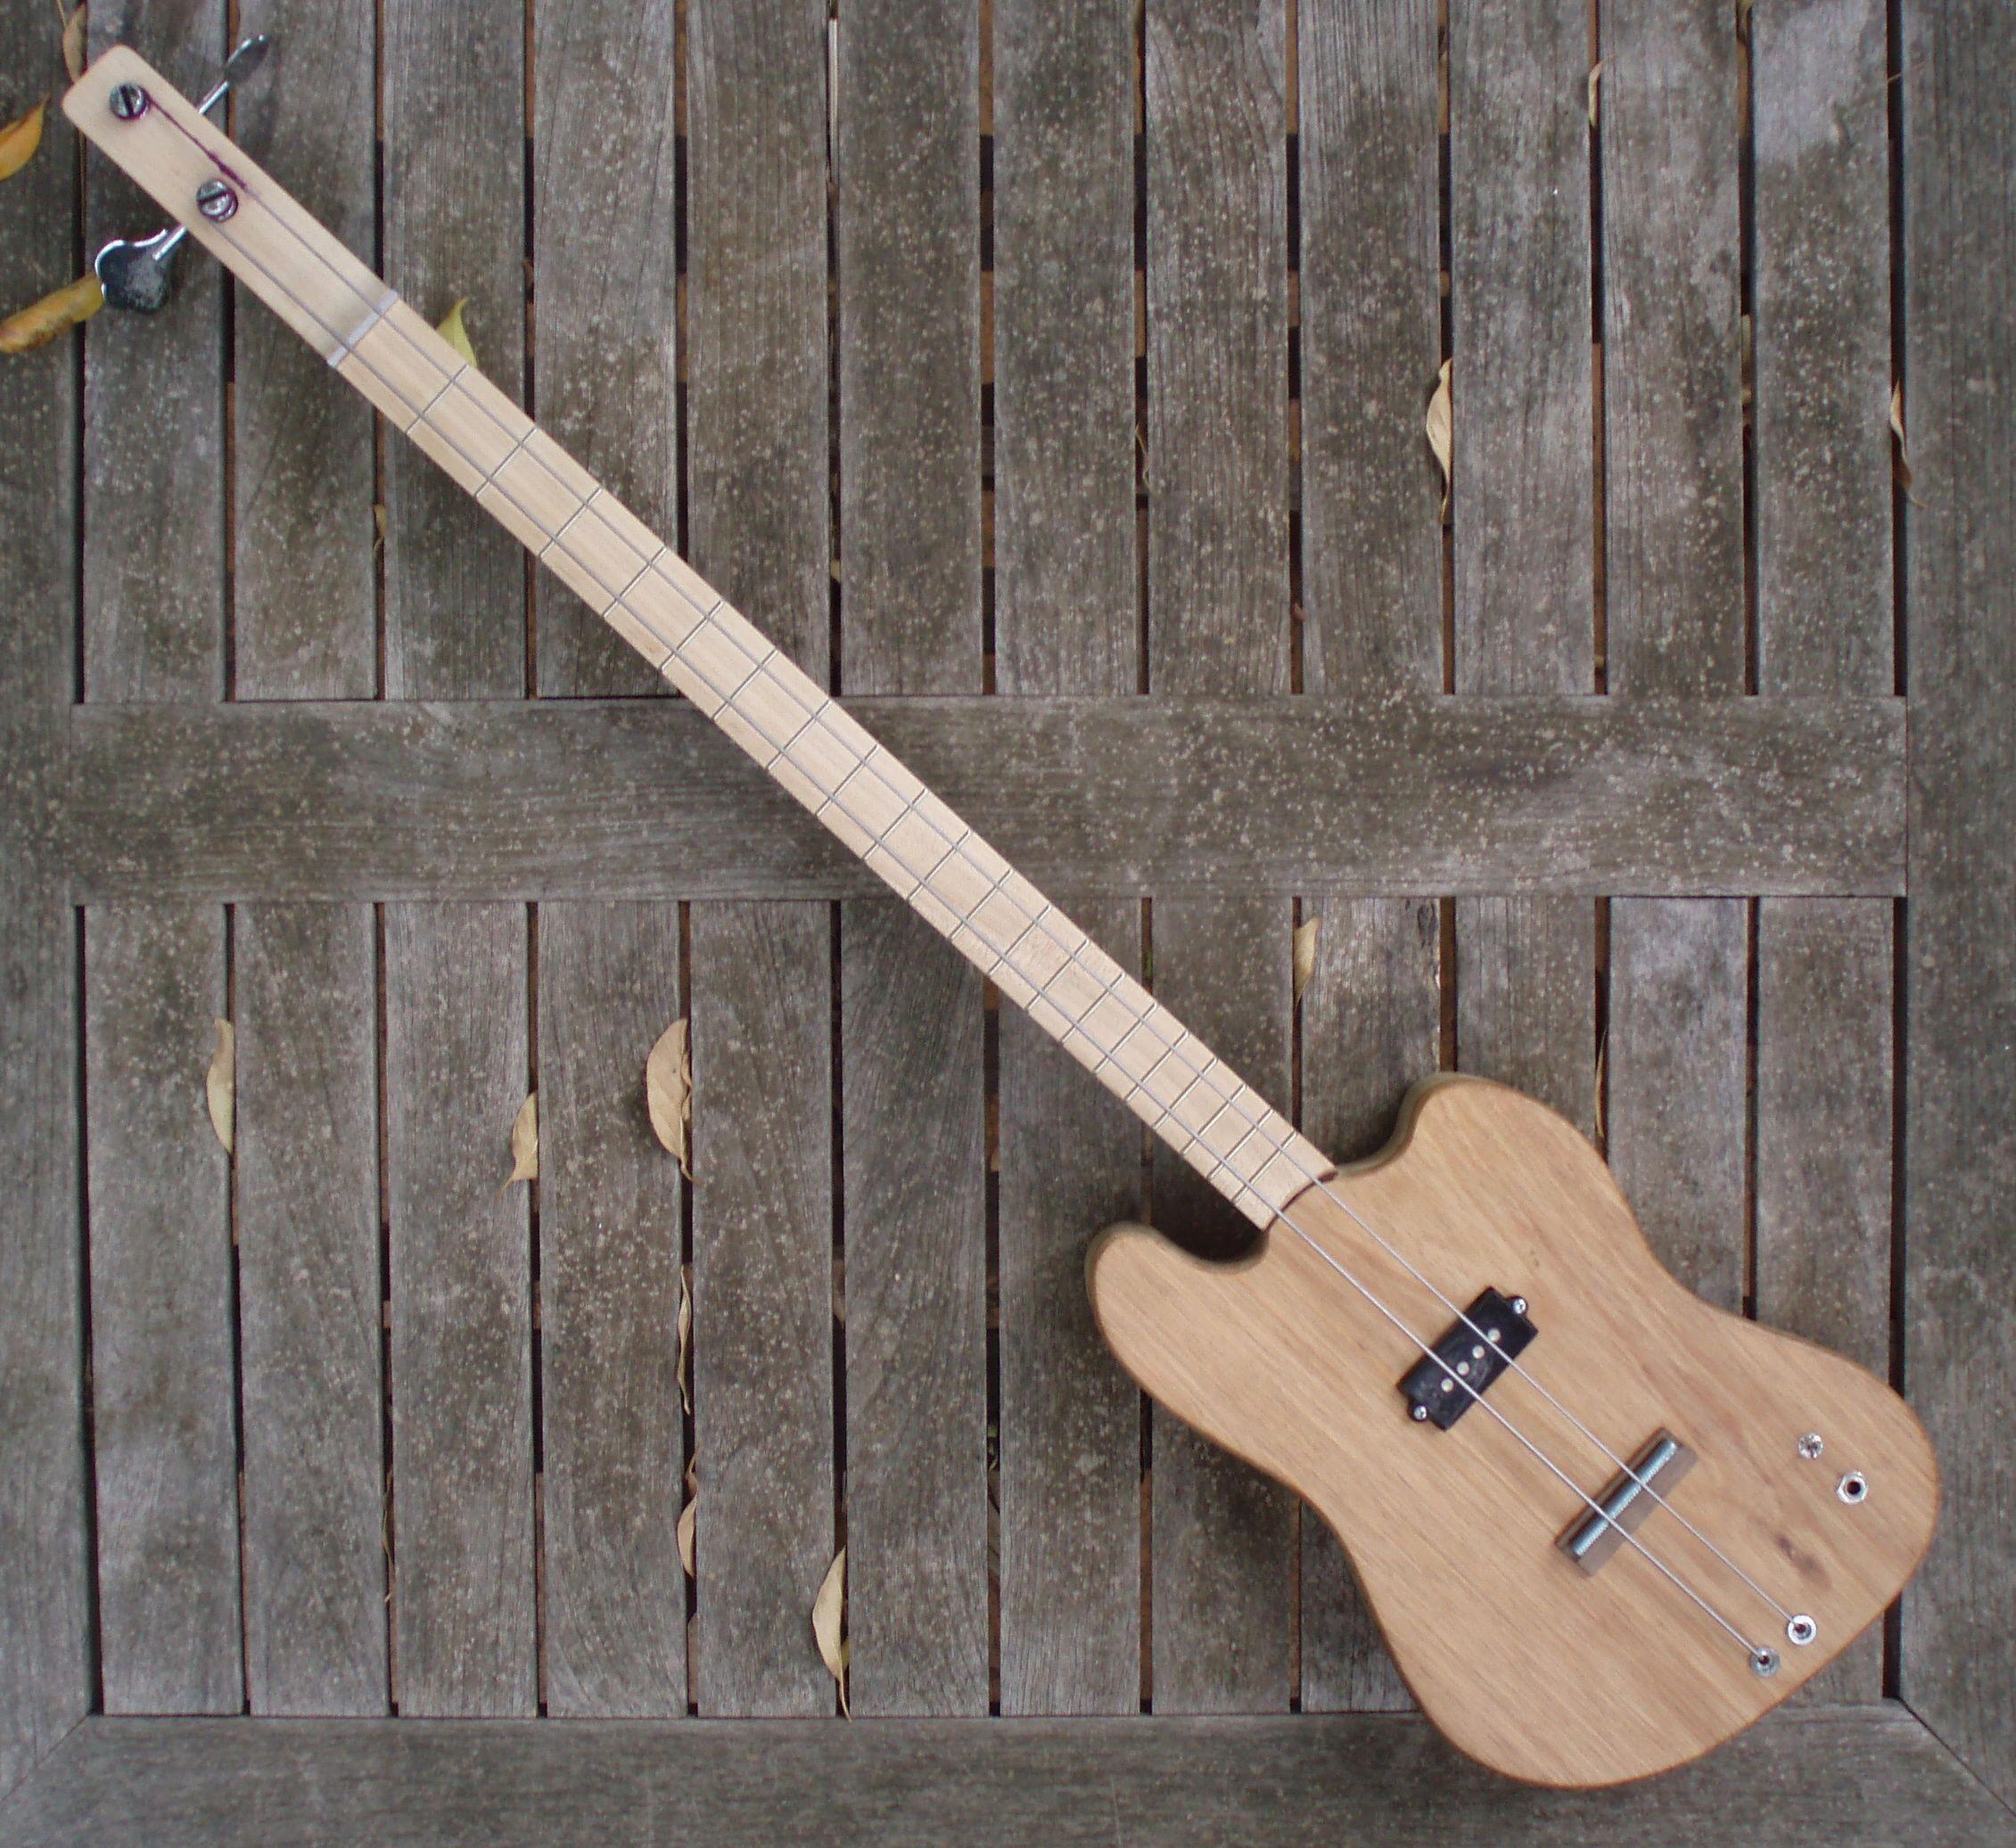 Pin on Cigar box guitar